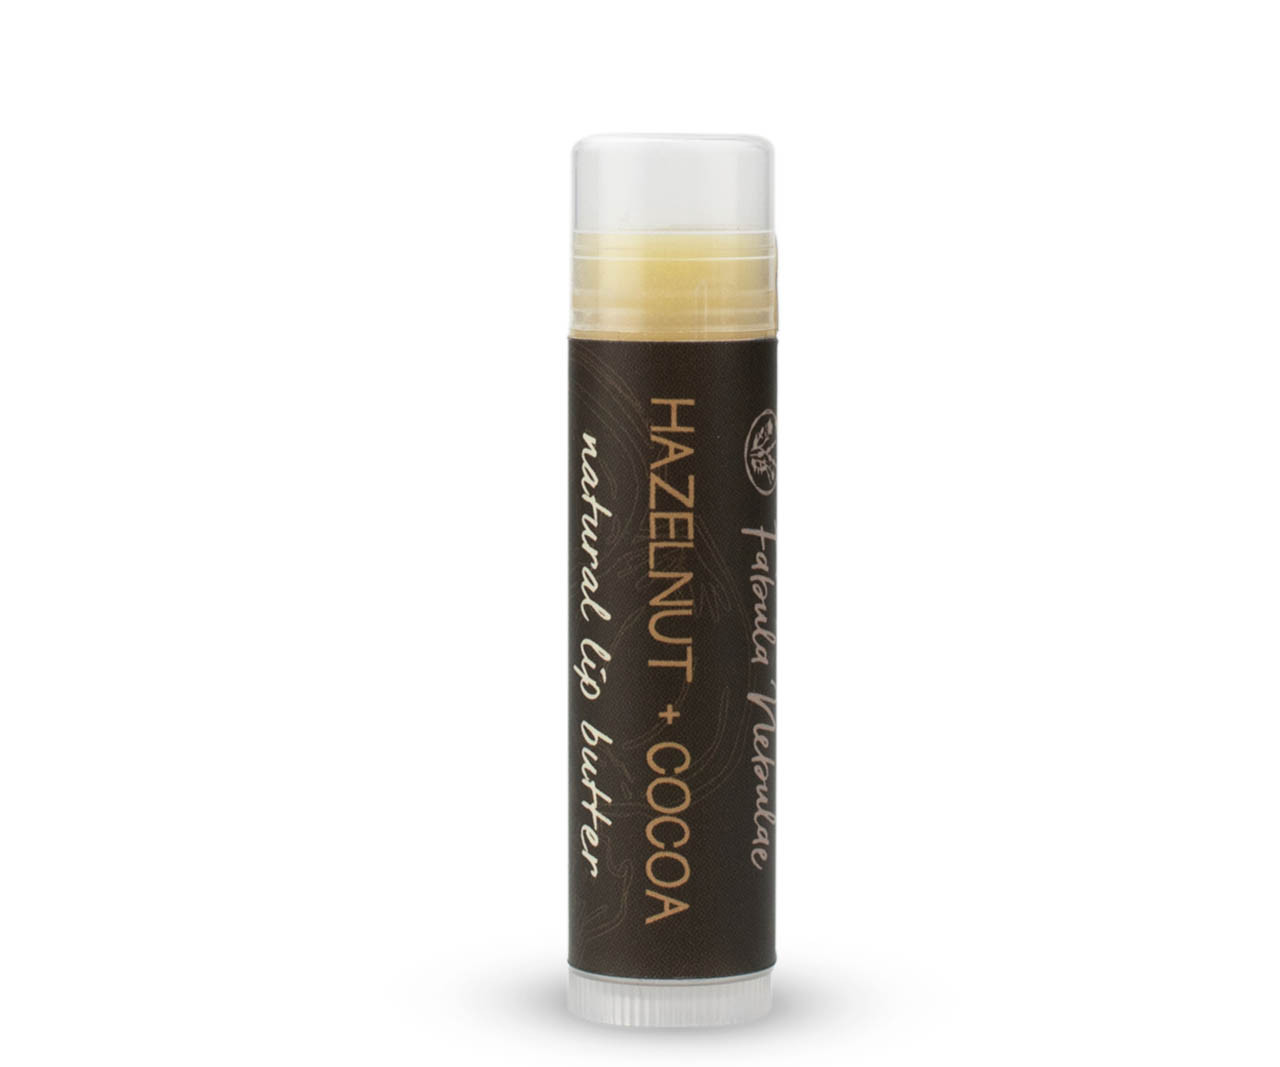 Fabula Nebulae Lip Balm Hazelnut & Cocoa